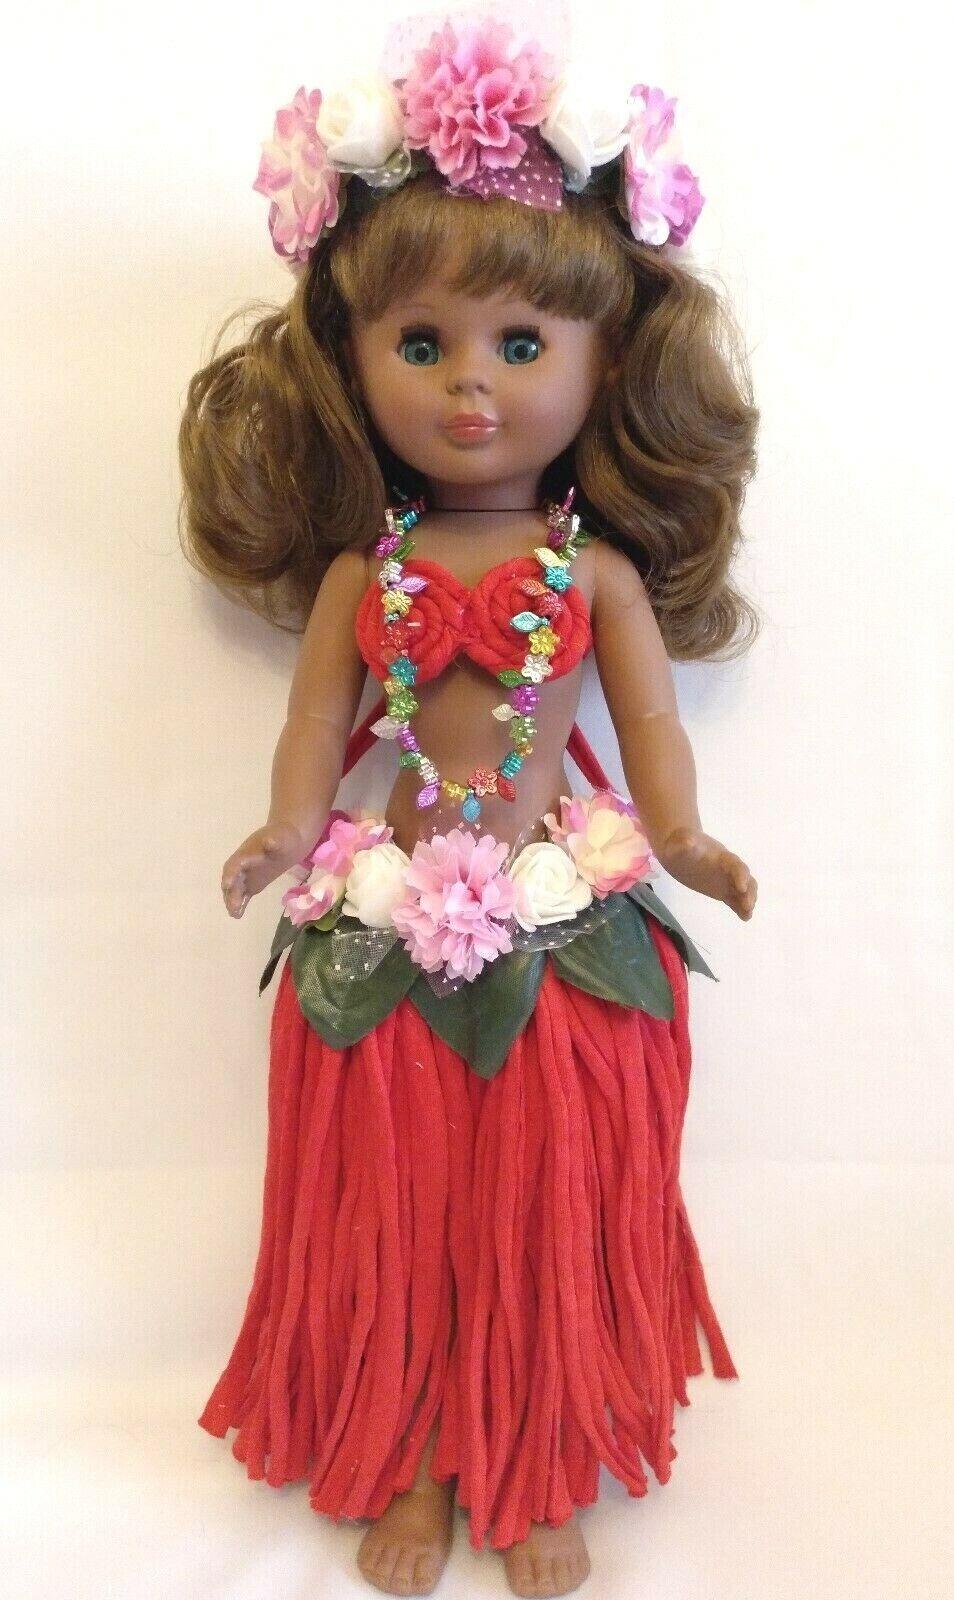 Muñeca KIKA Nº1 Hawaiana,mejor imitacion de nancy antigua de Famosa